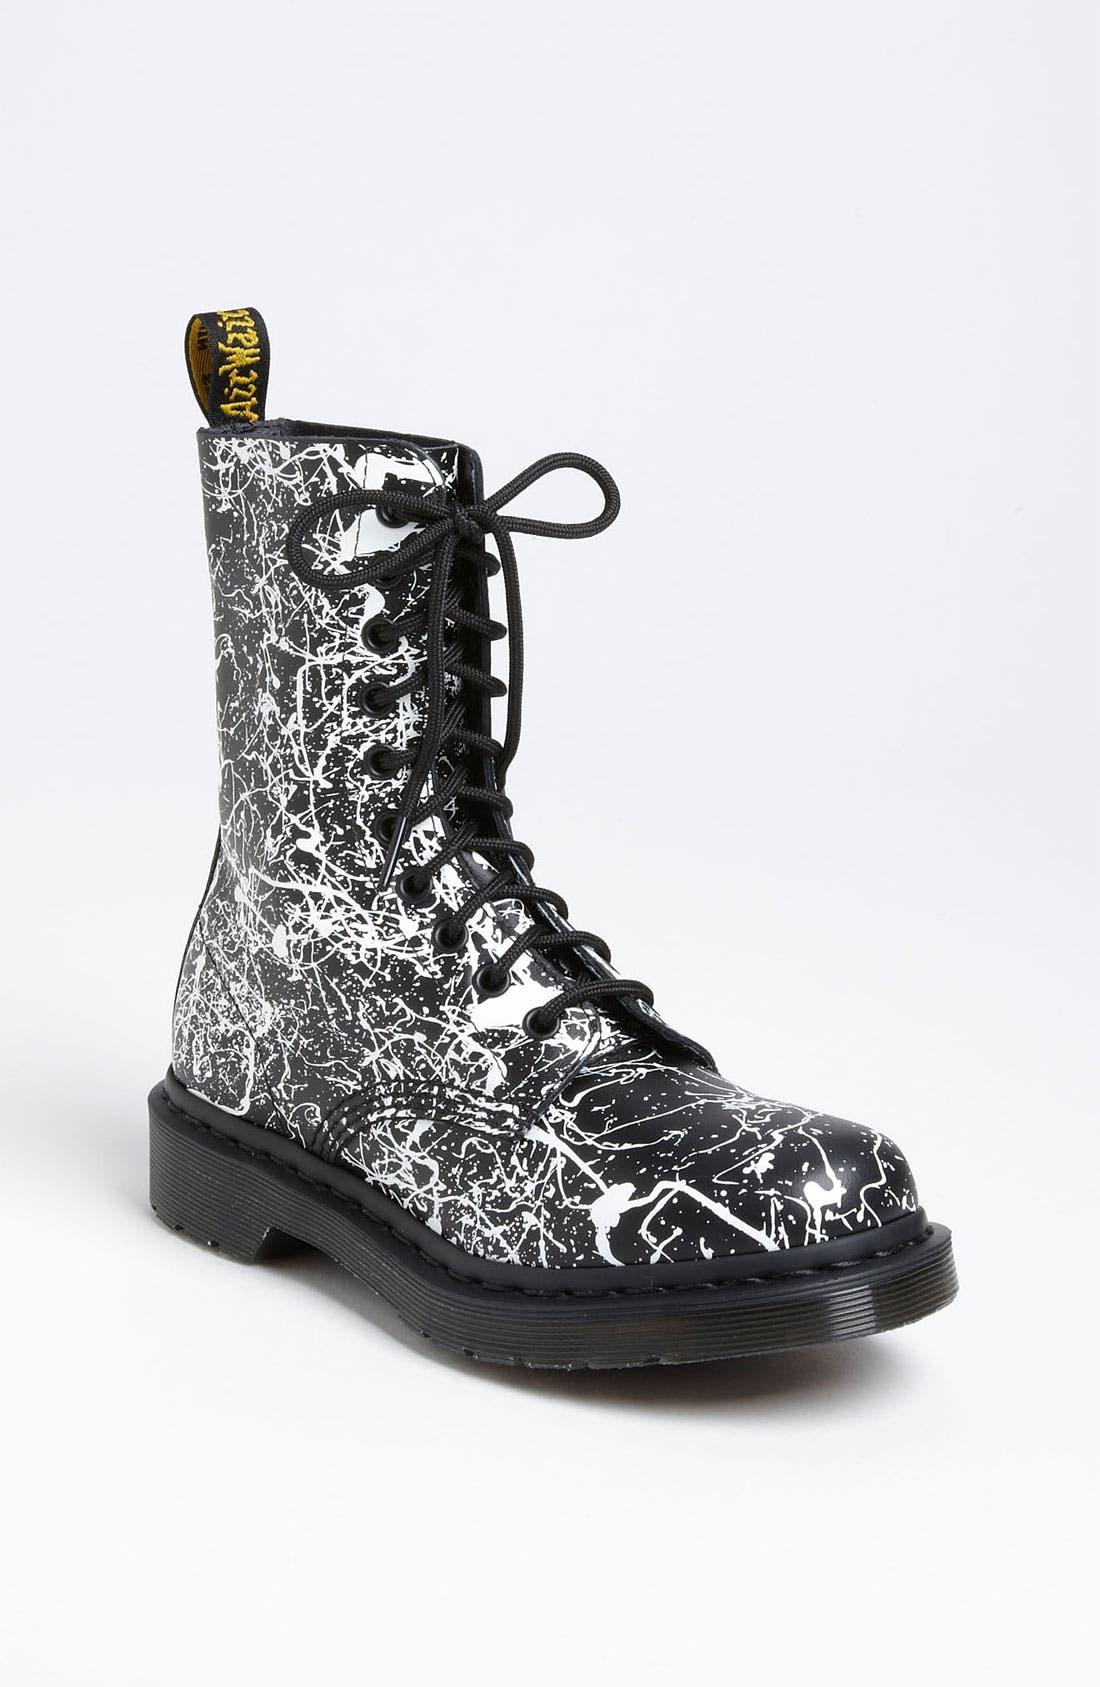 Alternate Image 1 Selected - Dr. Martens '1490' Boot